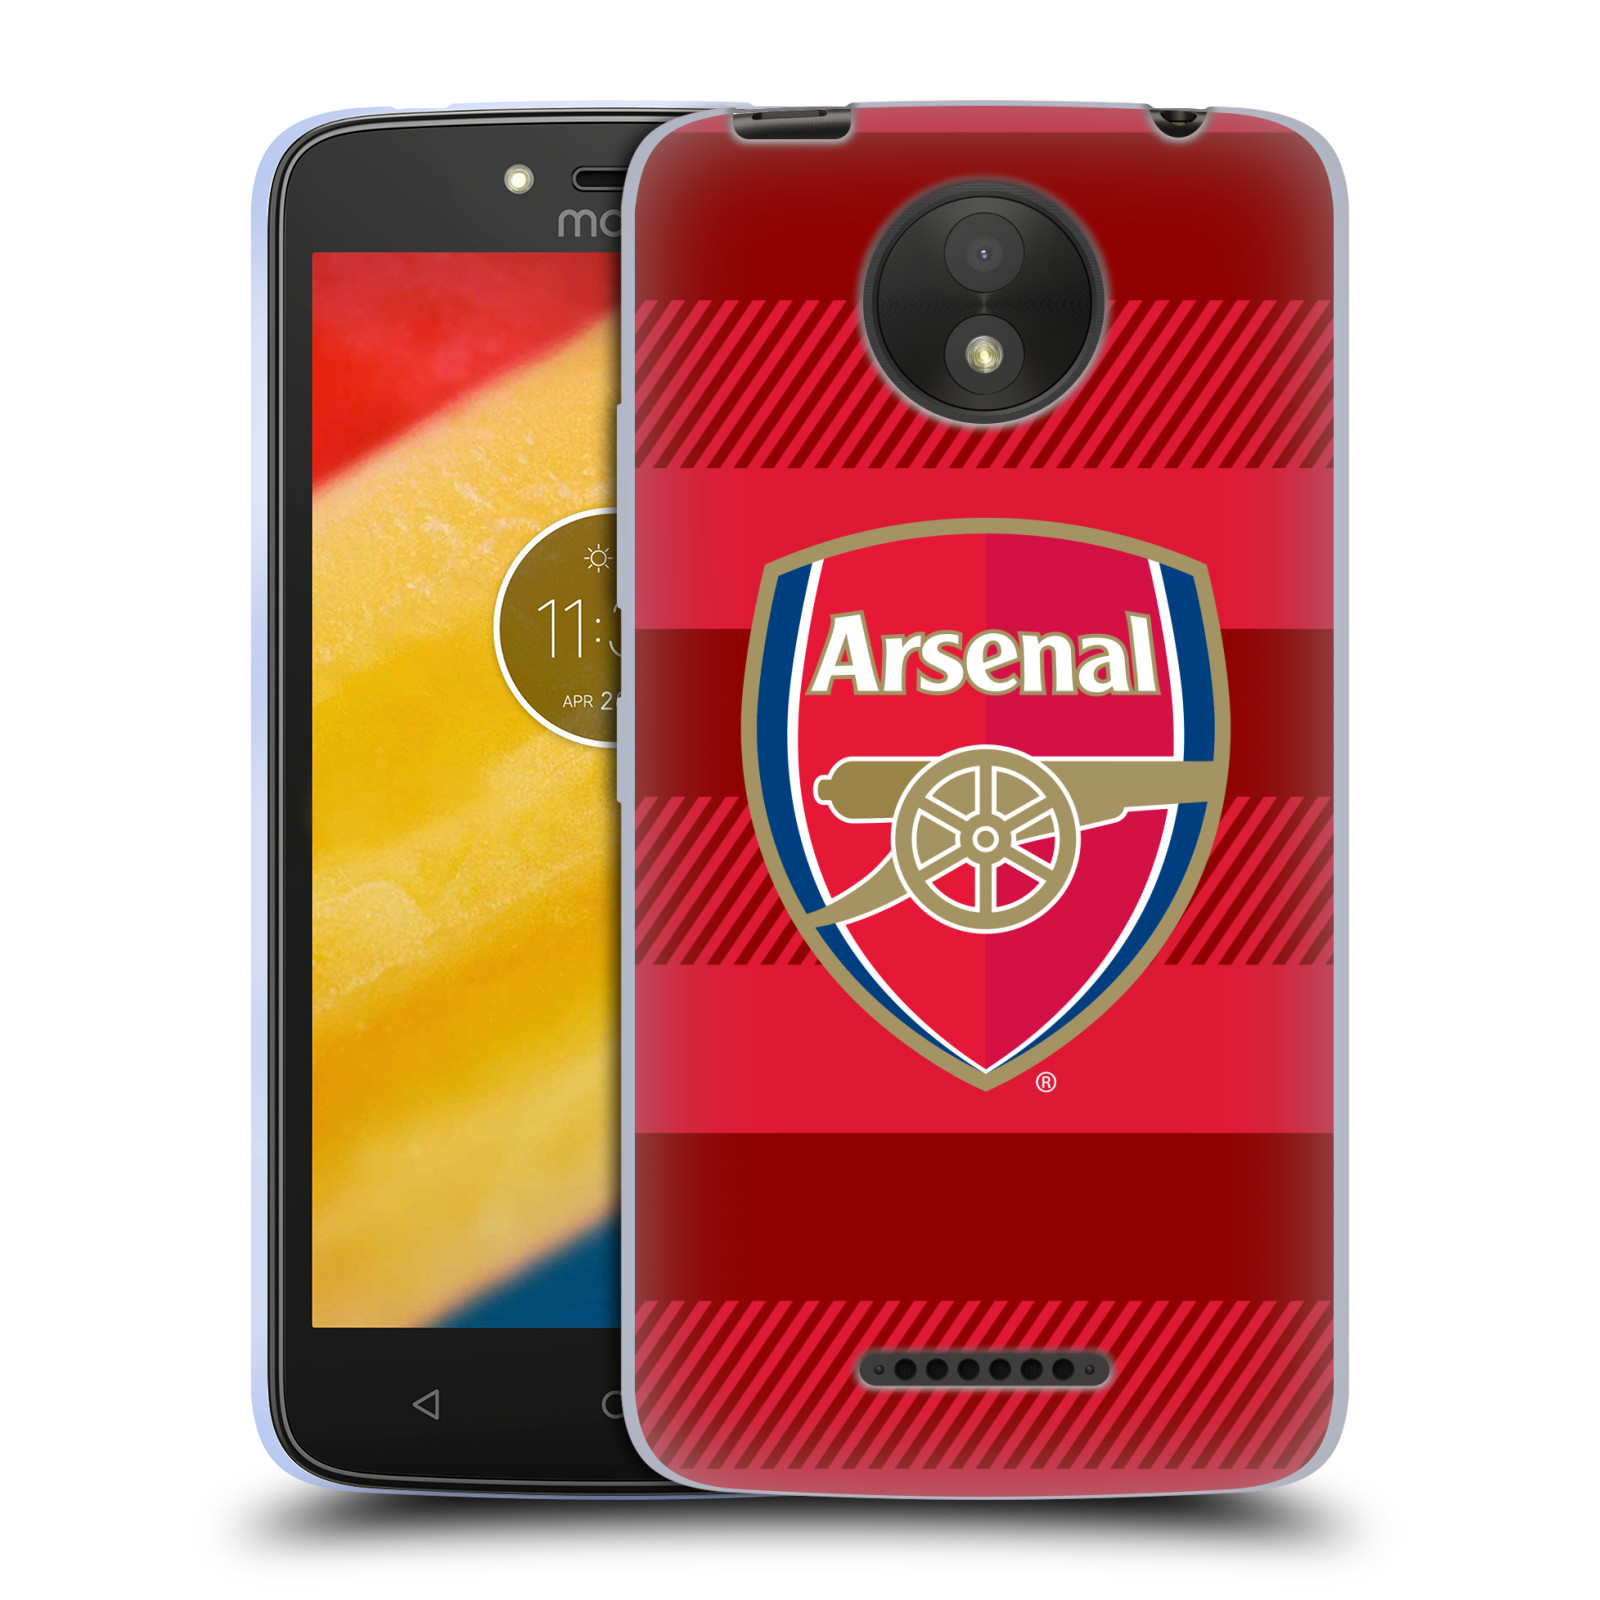 Silikonové pouzdro na mobil Lenovo Moto C Plus - Head Case - Arsenal FC - Logo s pruhy